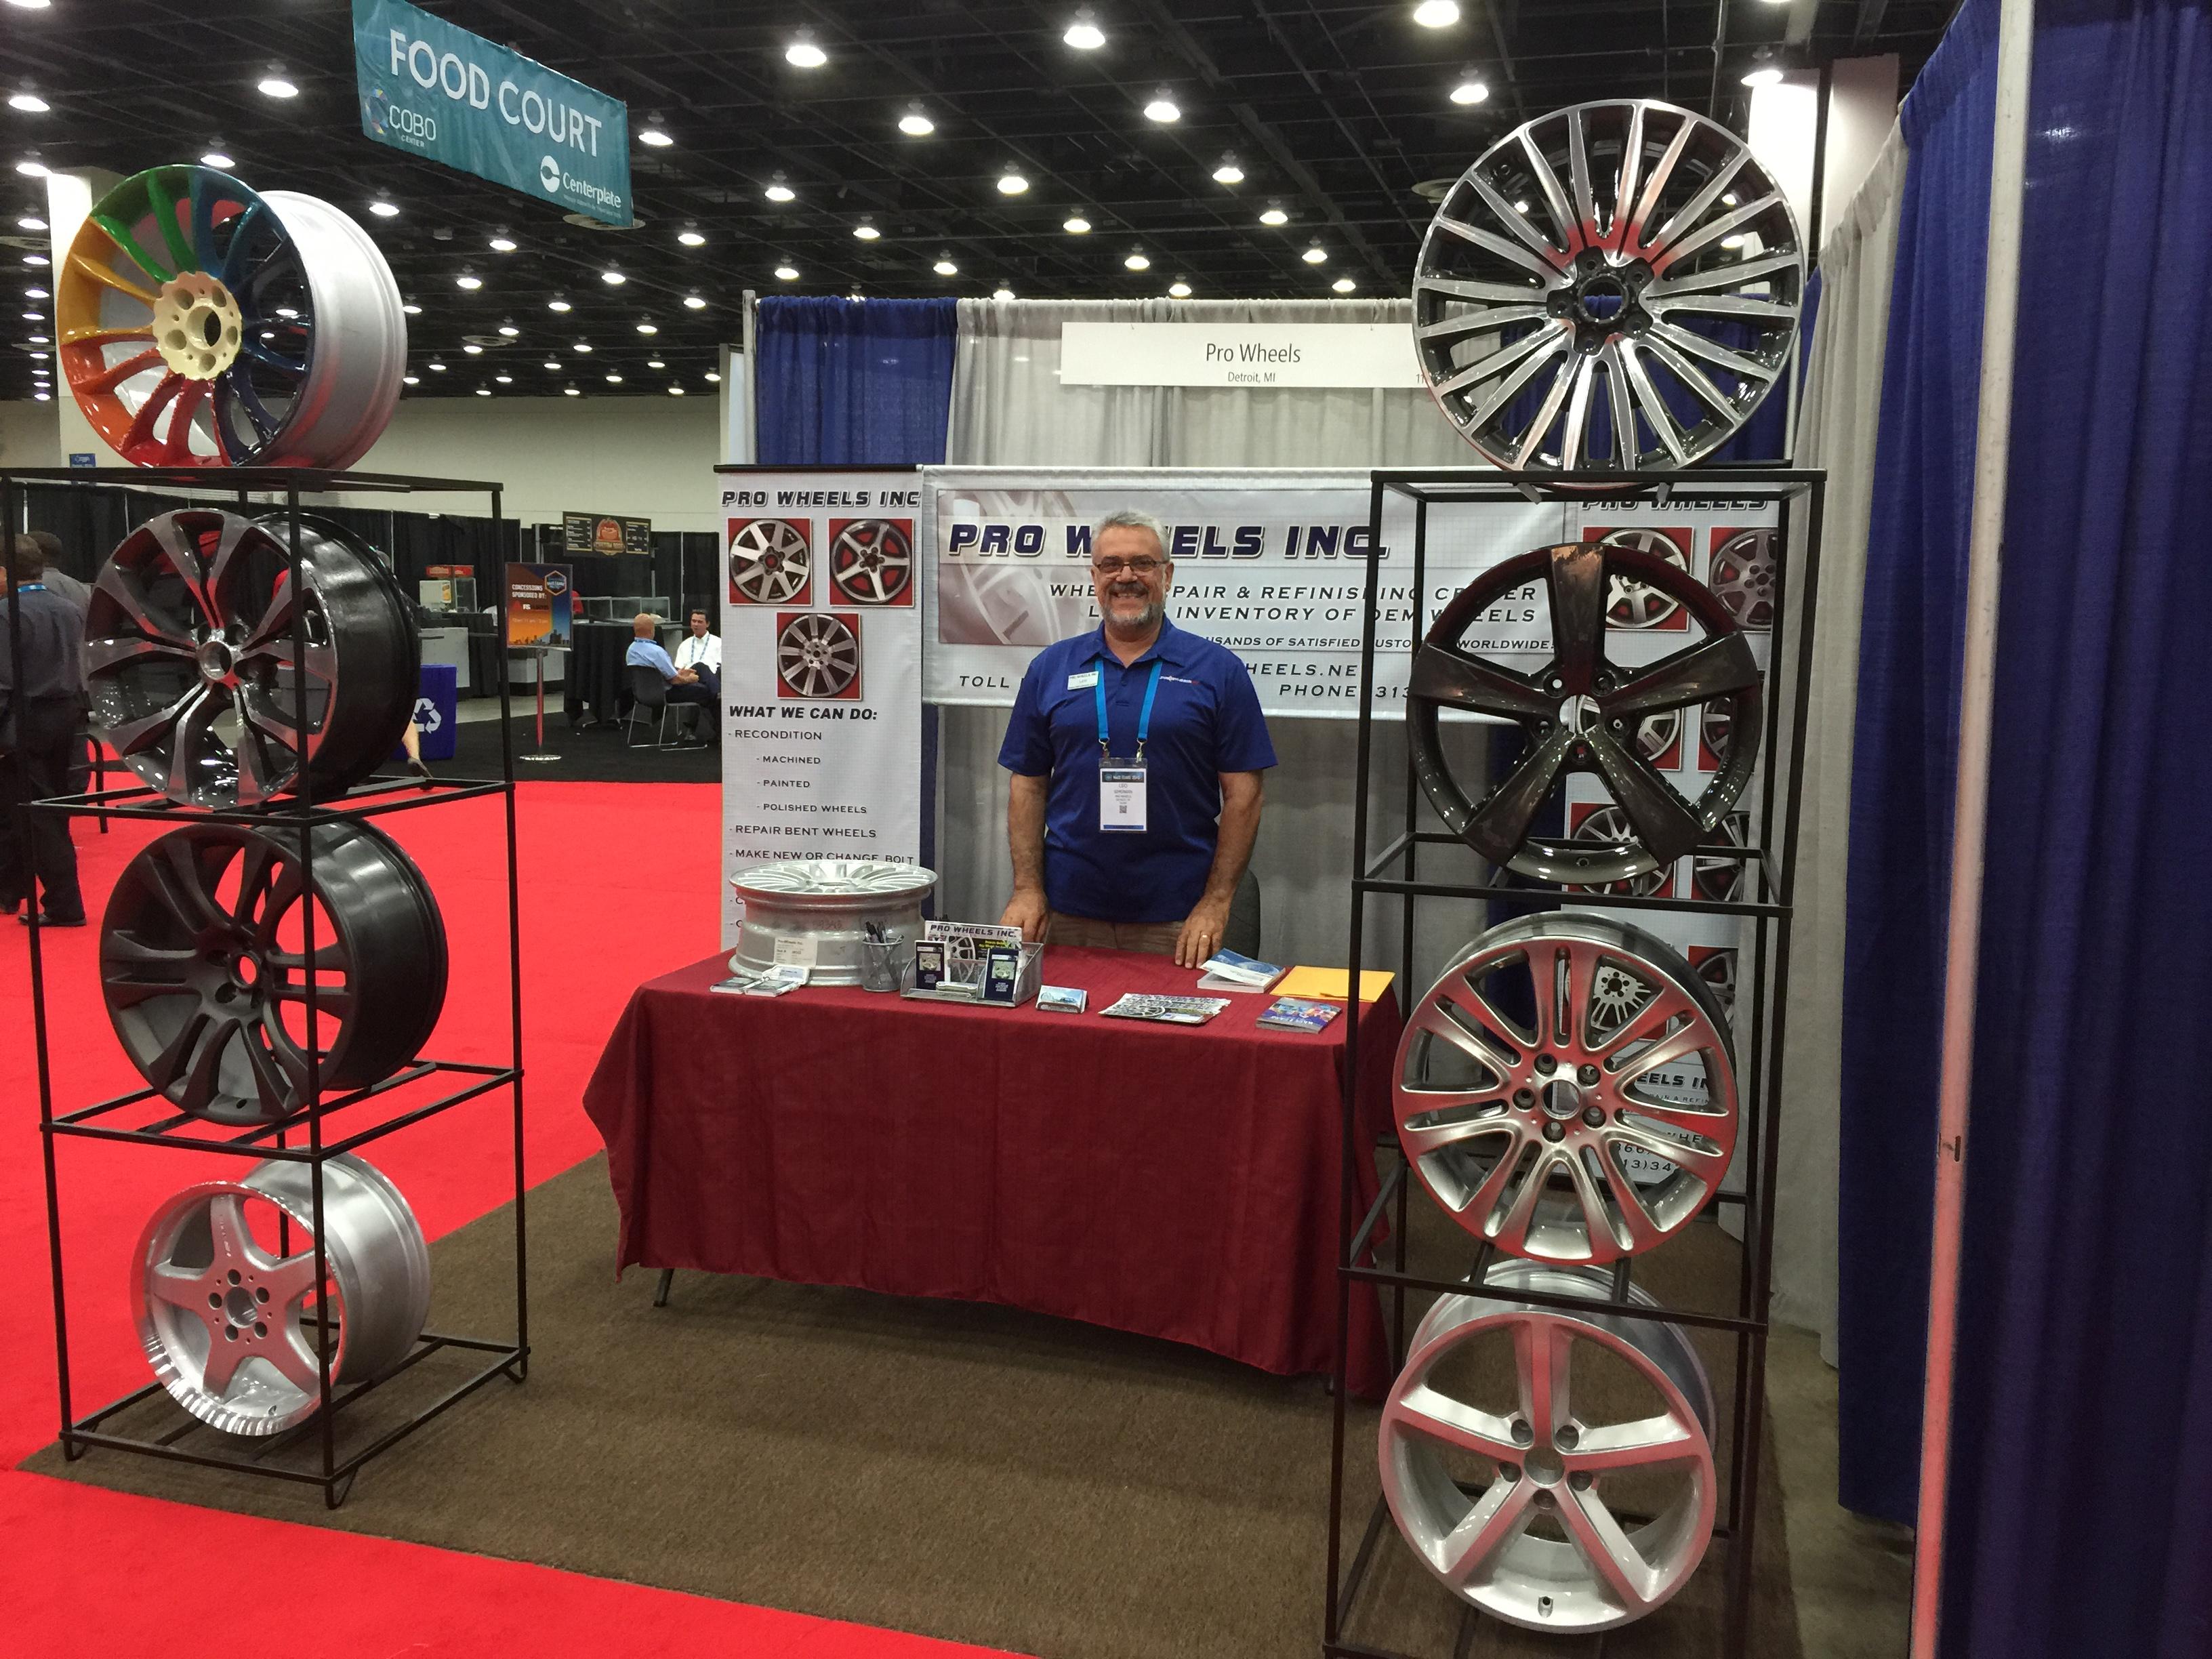 Pro Wheels Inc.